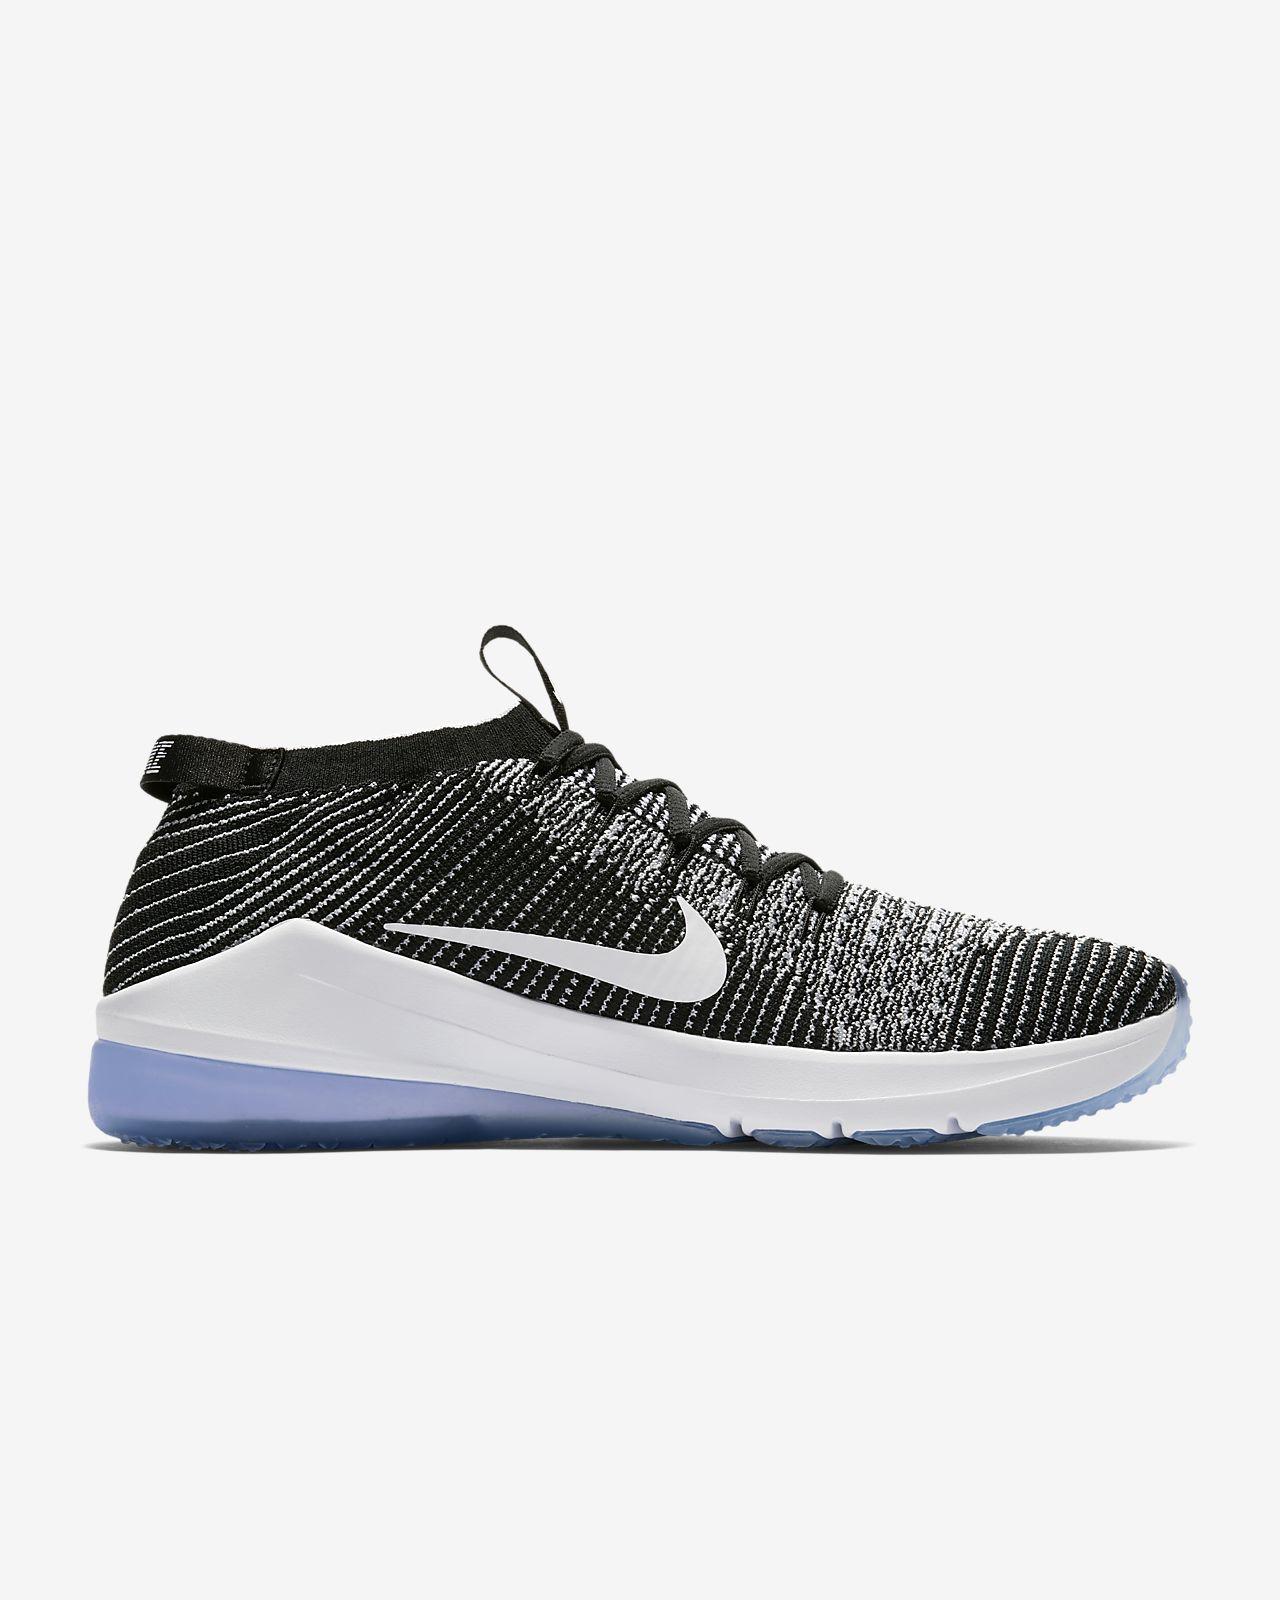 835adebcad ... Γυναικείο παπούτσι γυμναστηρίου προπόνησης πυγμαχίας Nike Air Zoom  Fearless Flyknit 2